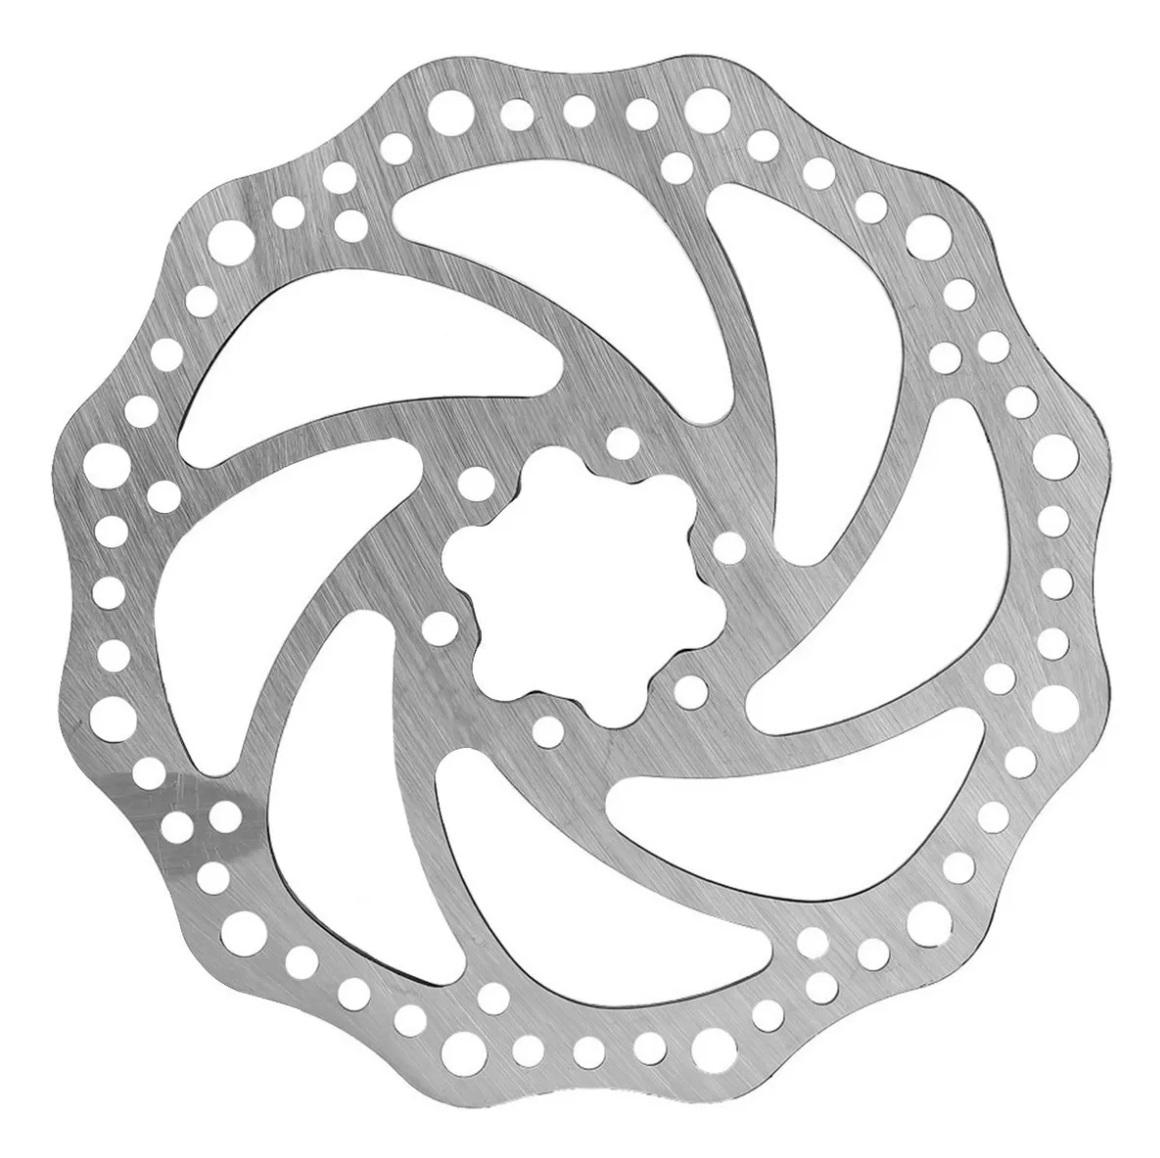 Disco Rotor Absolute 203mm Freio Mec Hidr Mtb Xc Bike 6 Furo